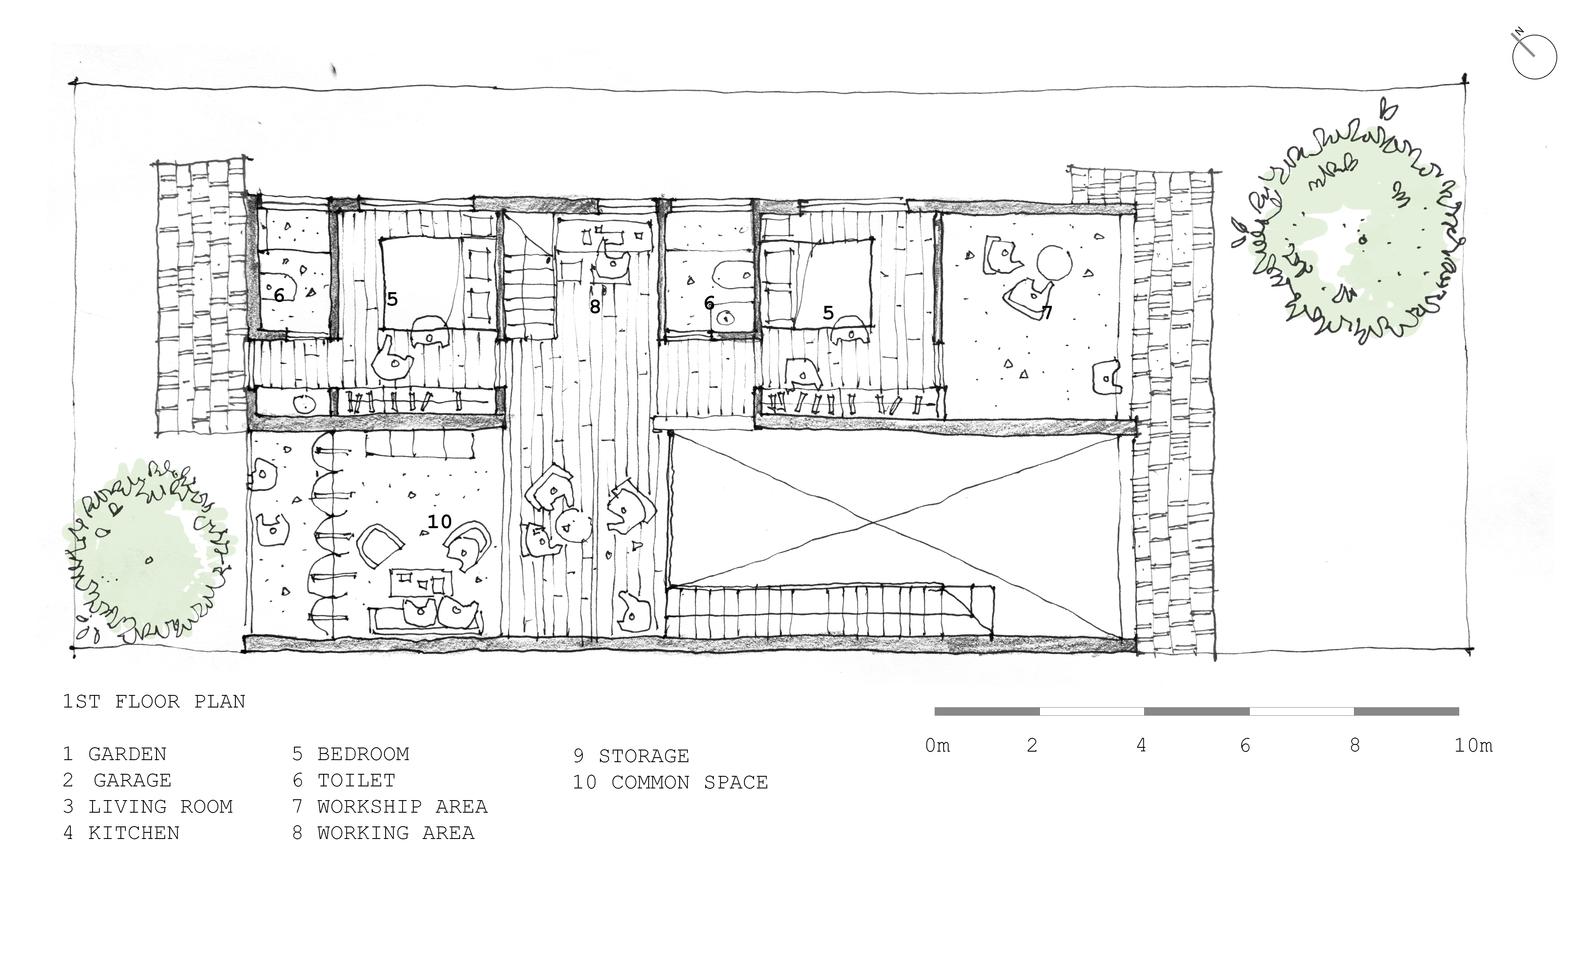 medium resolution of tile roof house k59atelier first floor plan